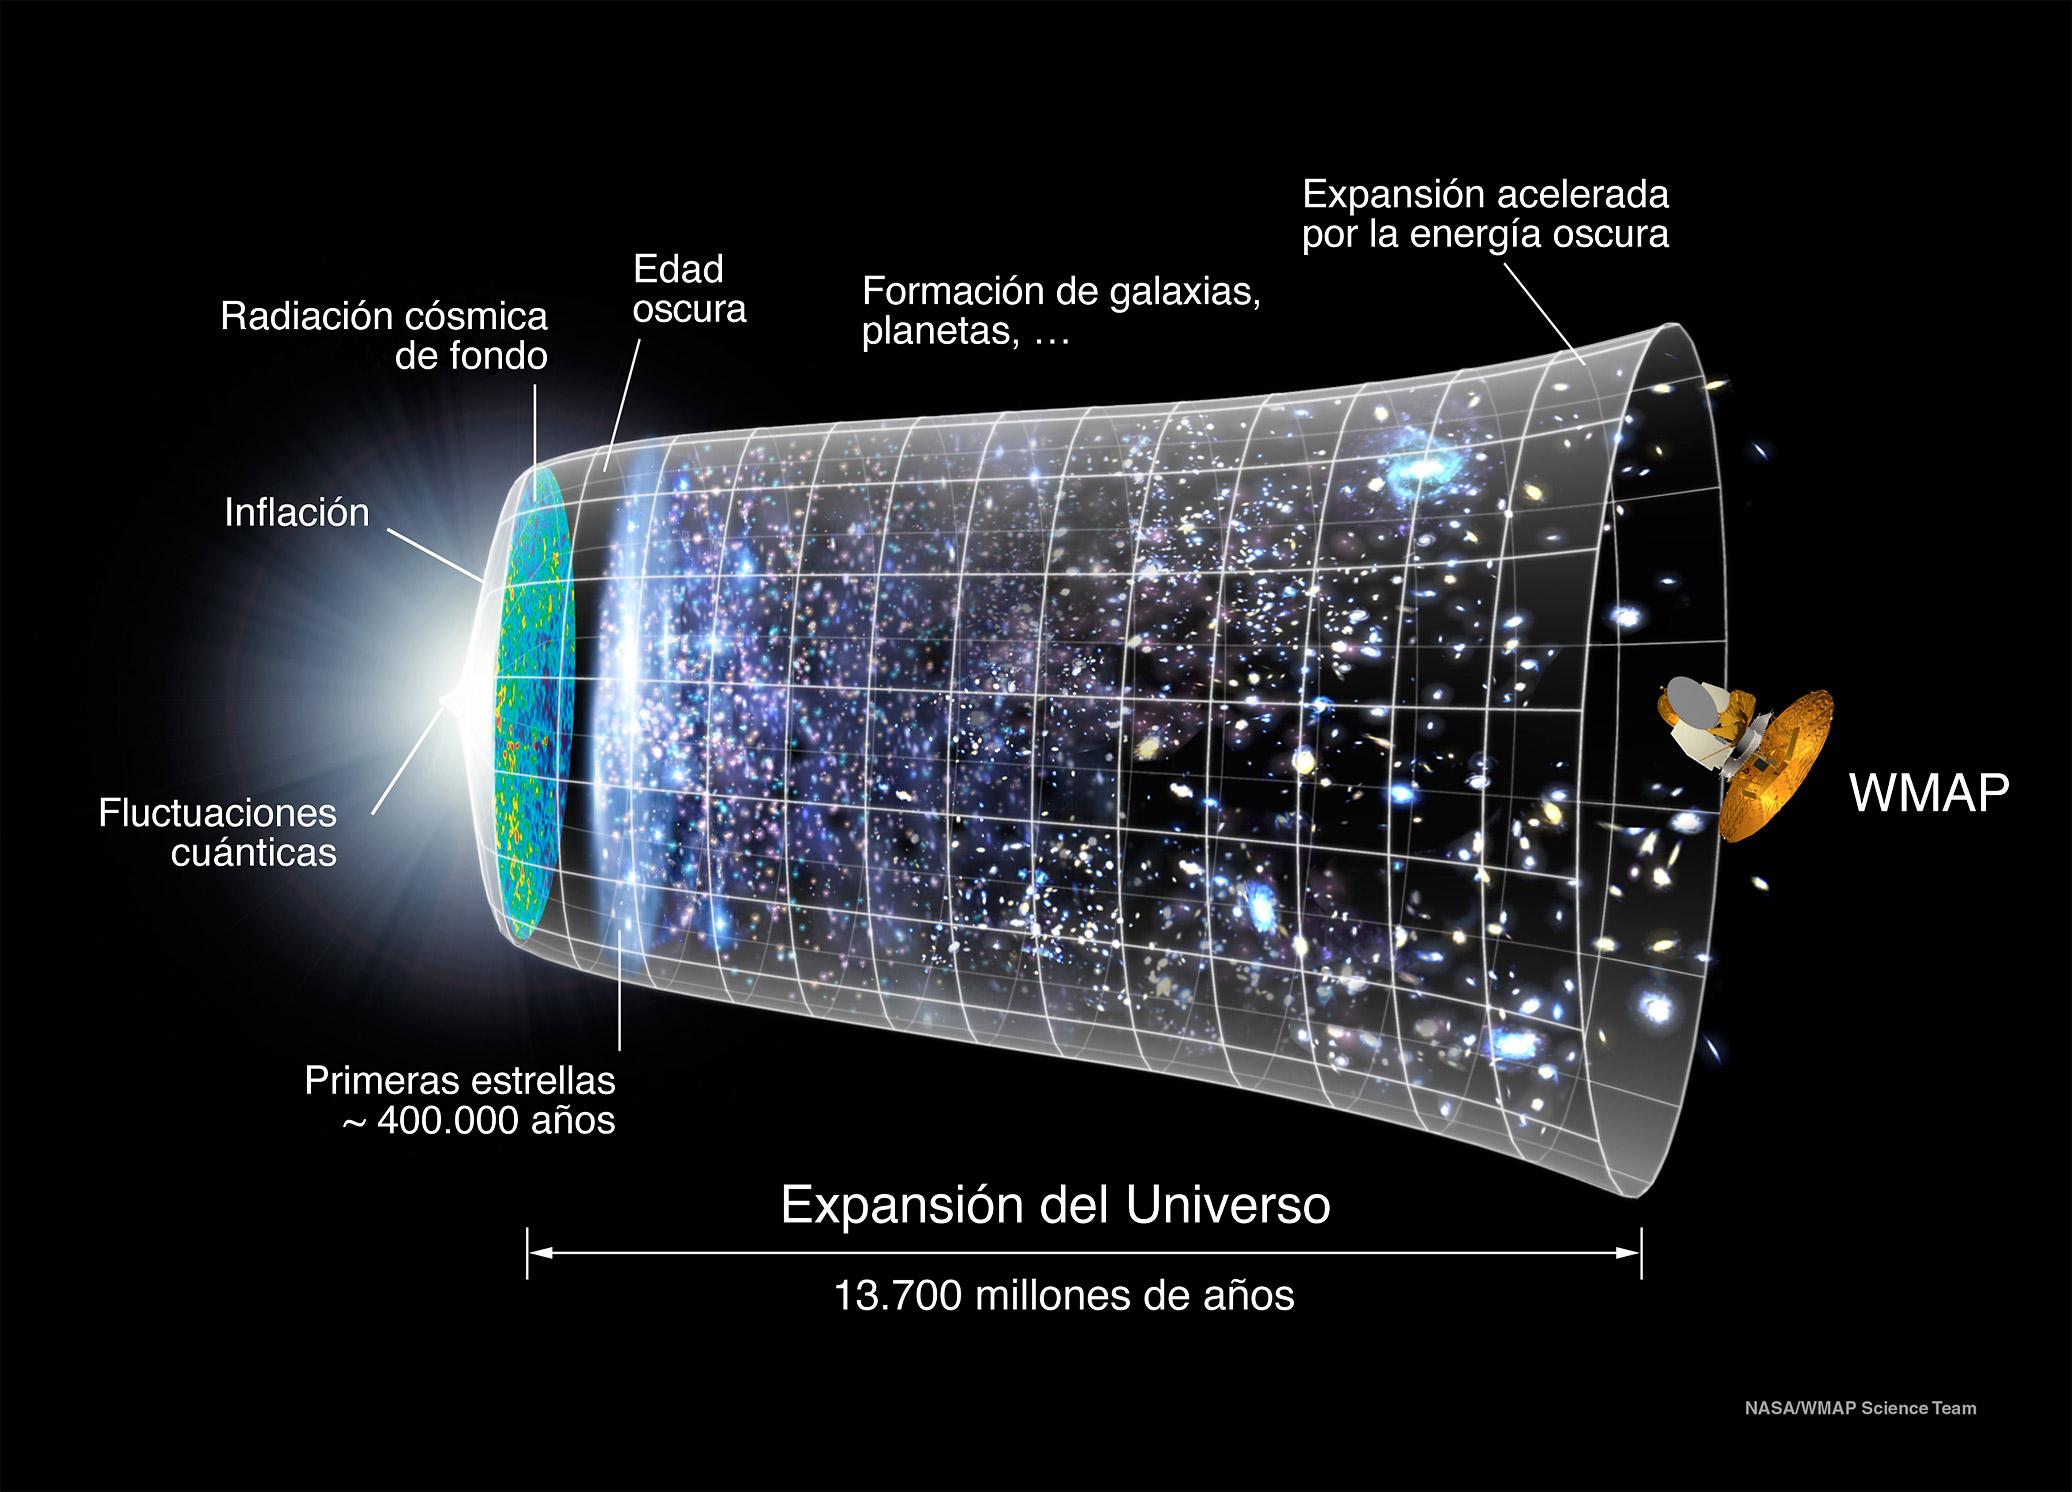 Expansion del Universo